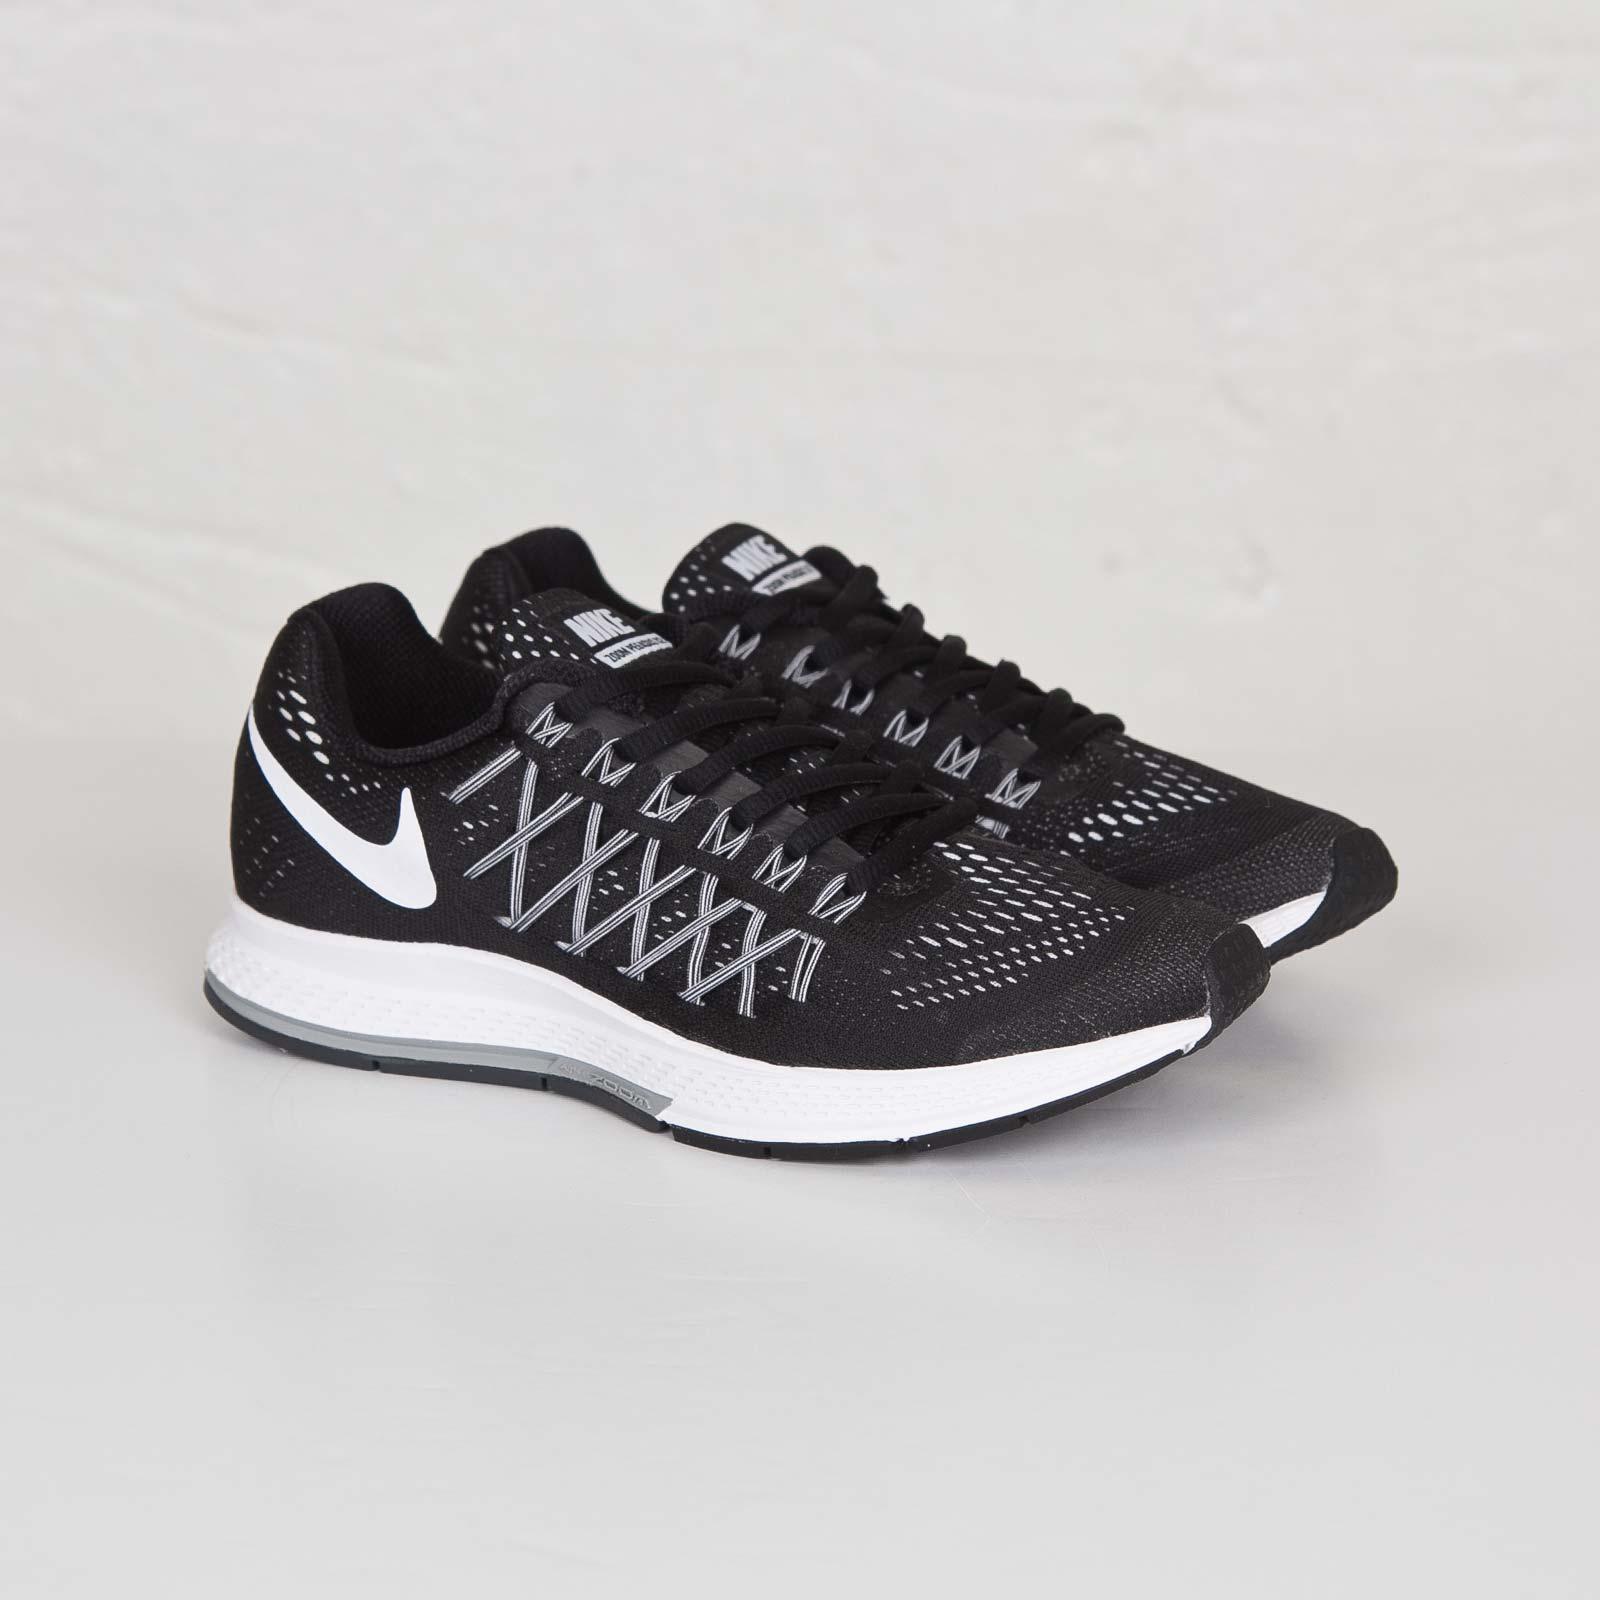 Nike Air Zoom Pegasus 32 Women's Athletic Shoe 749344 001 Size 5.5